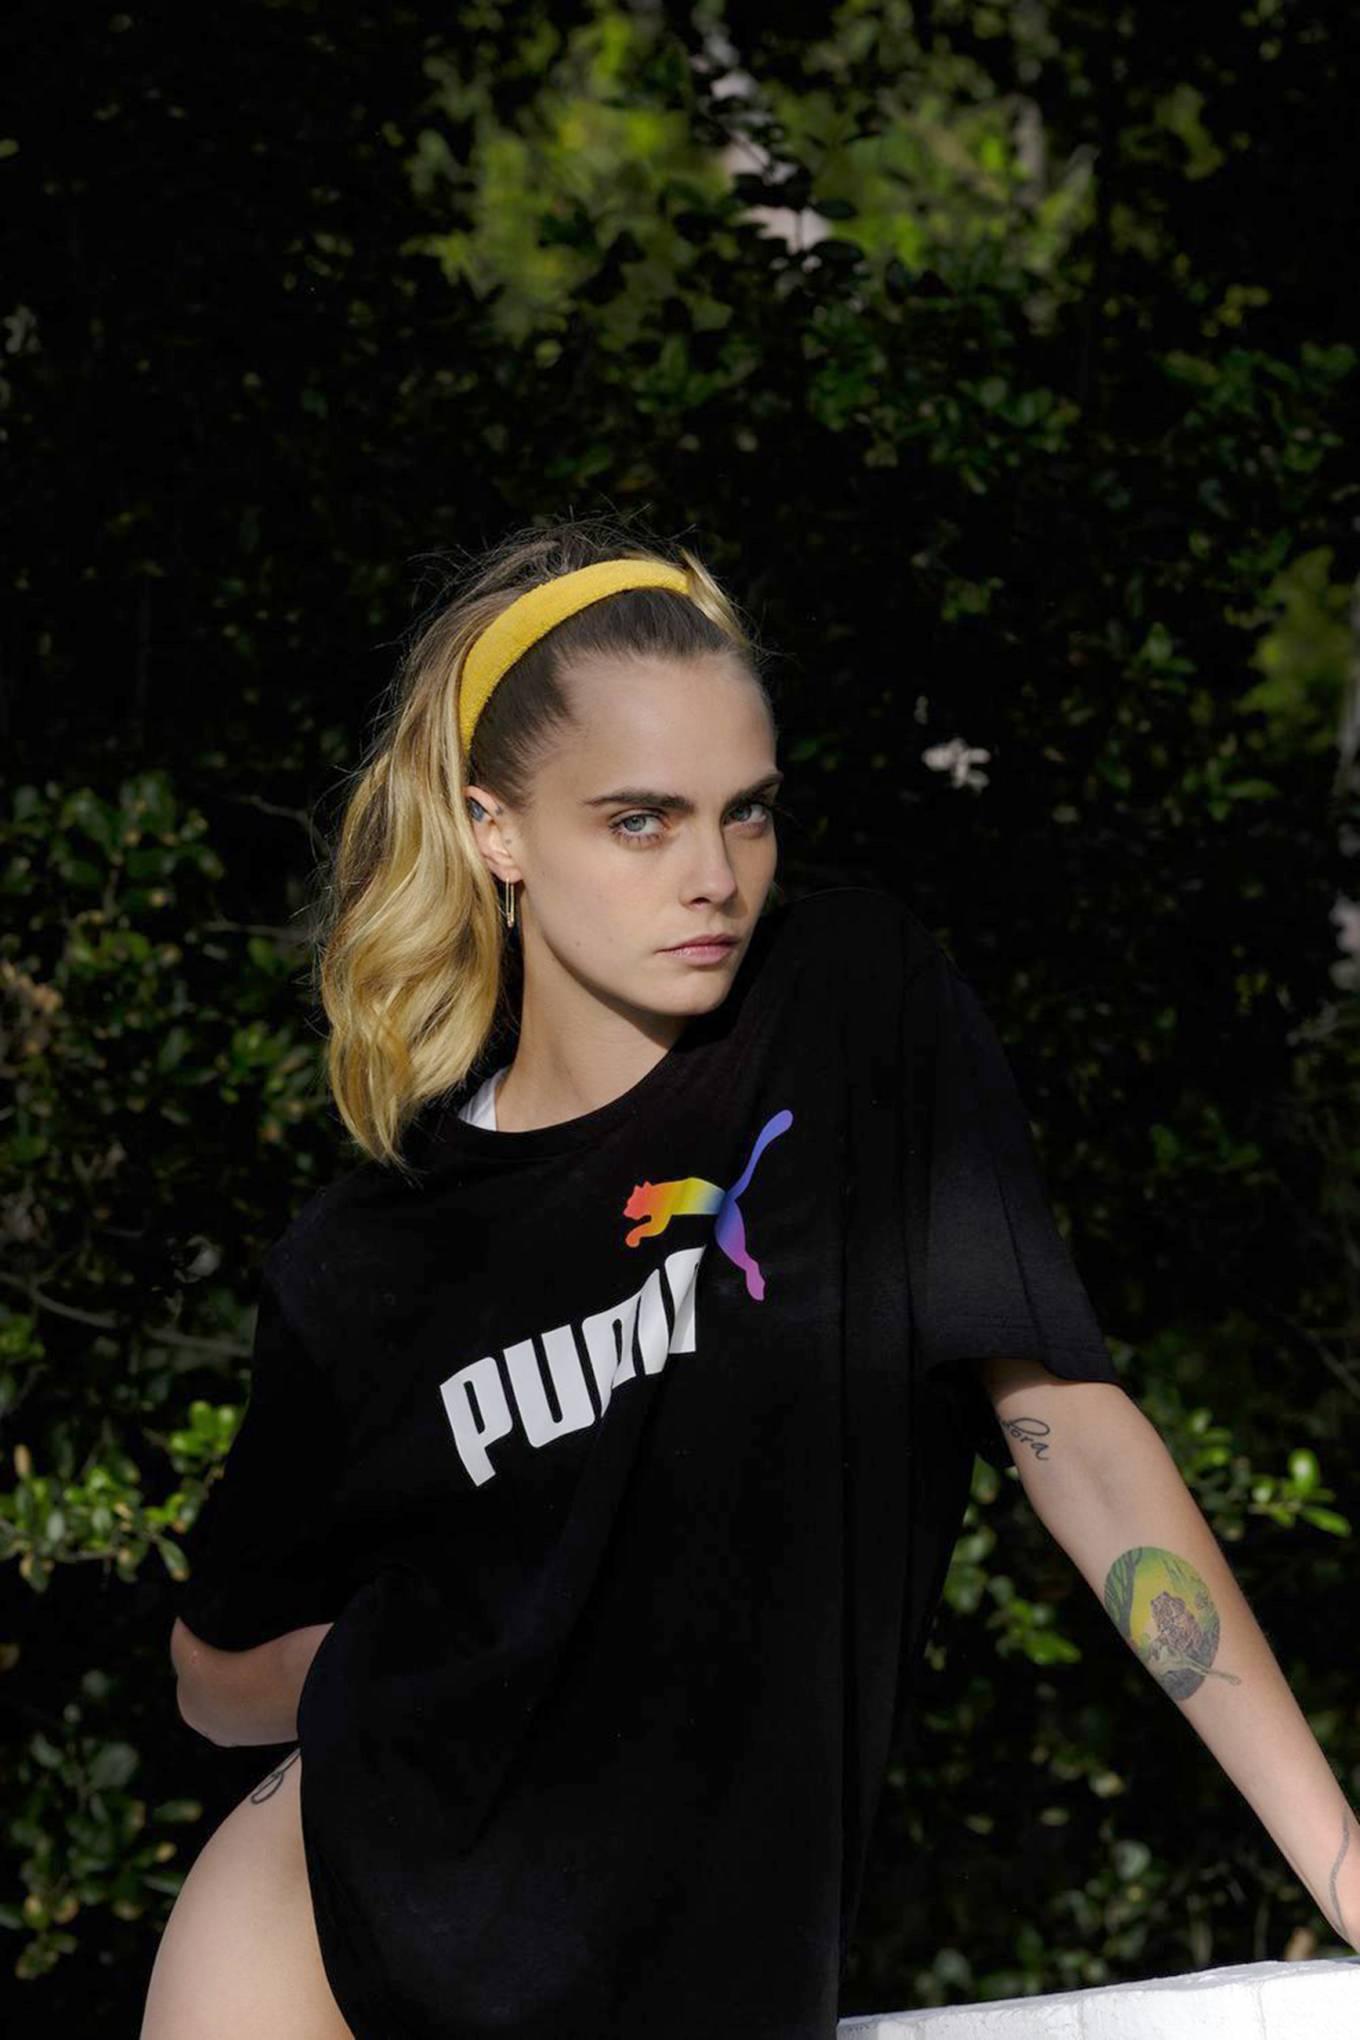 Cara Delevingne 2020 : Cara Delevingne – Photoshoot for PUMA Campaign 2020-01